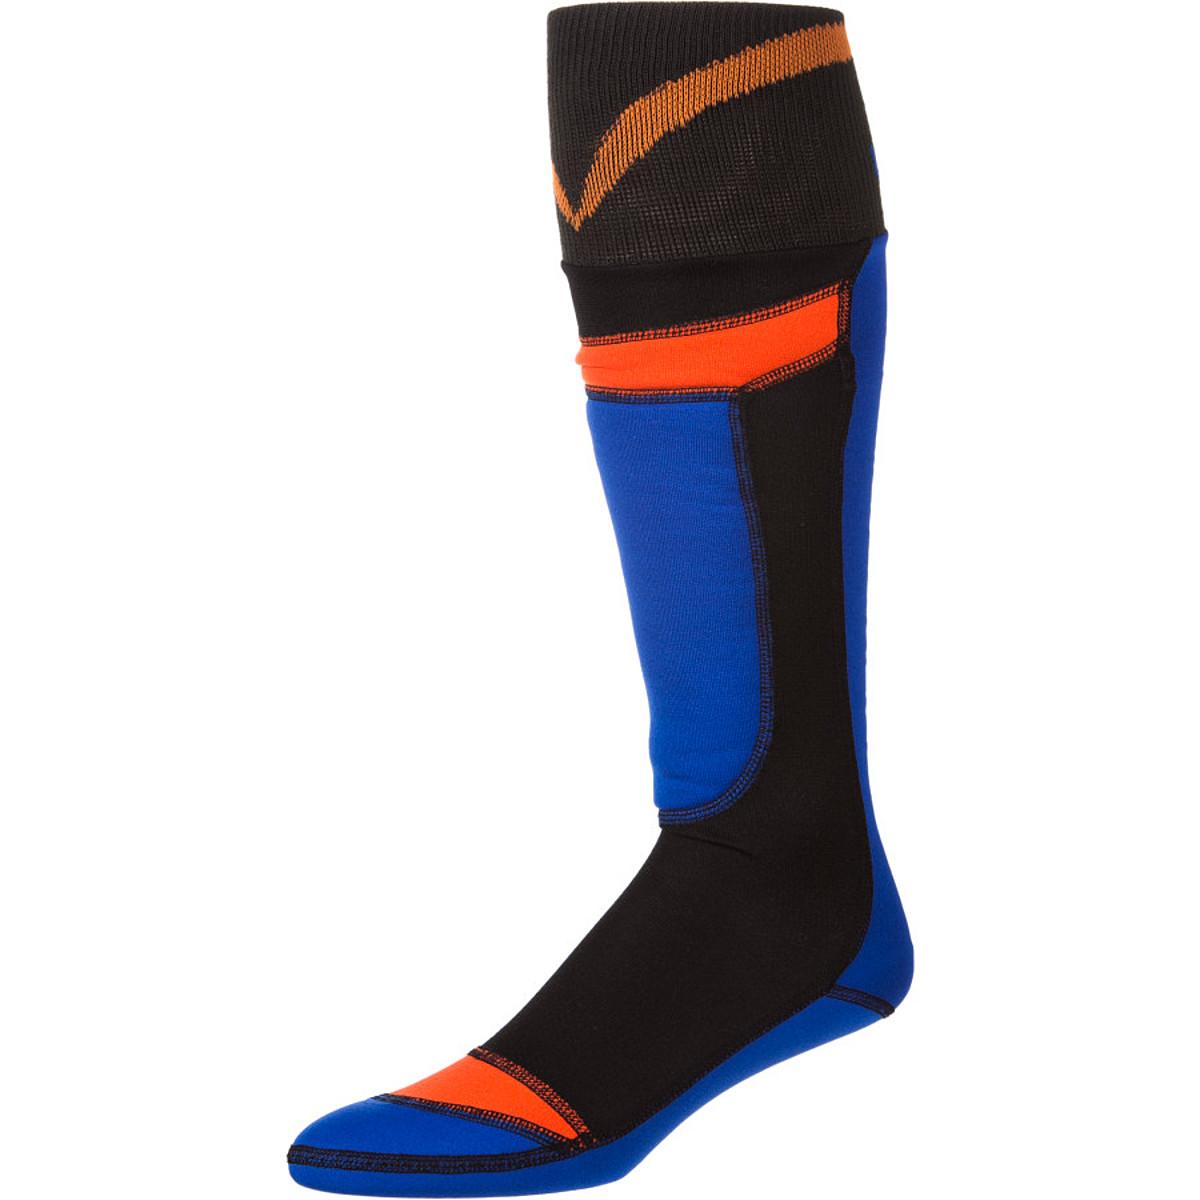 Lorpen Polartec Ultralight Ski Sock